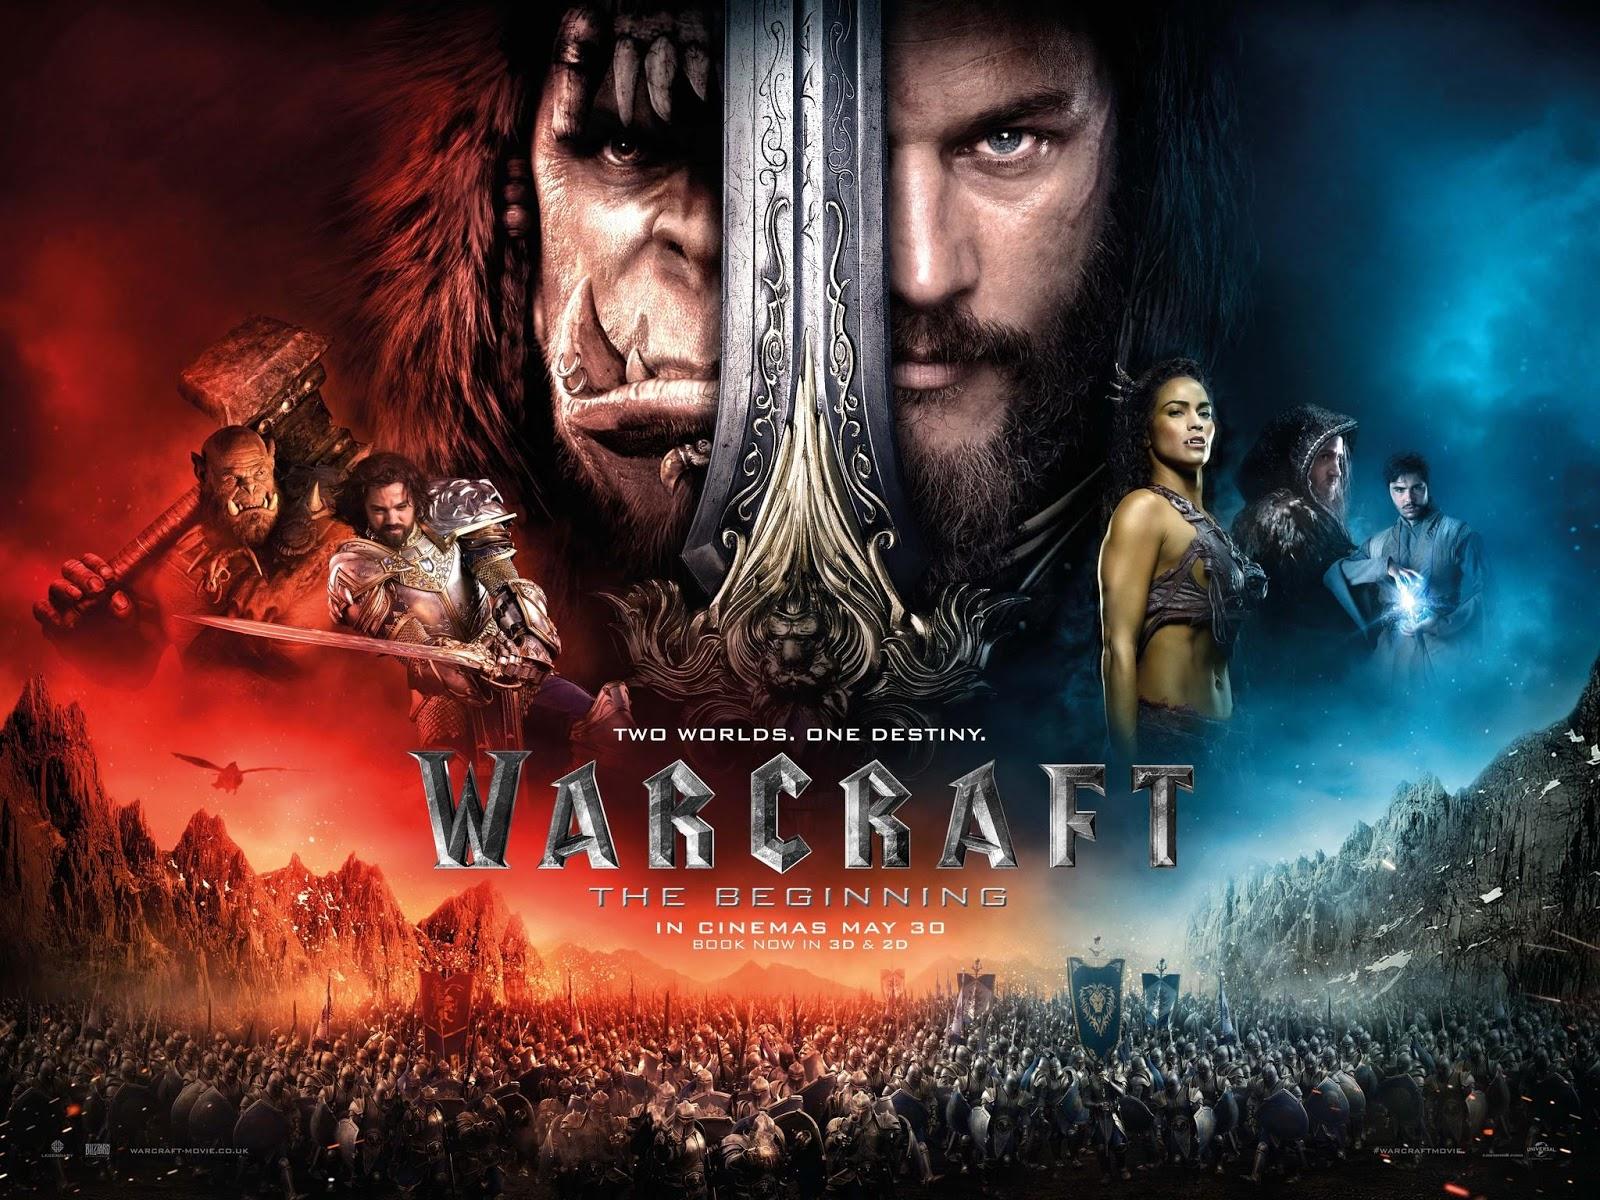 Warcraft Bud Daily Box fice Results